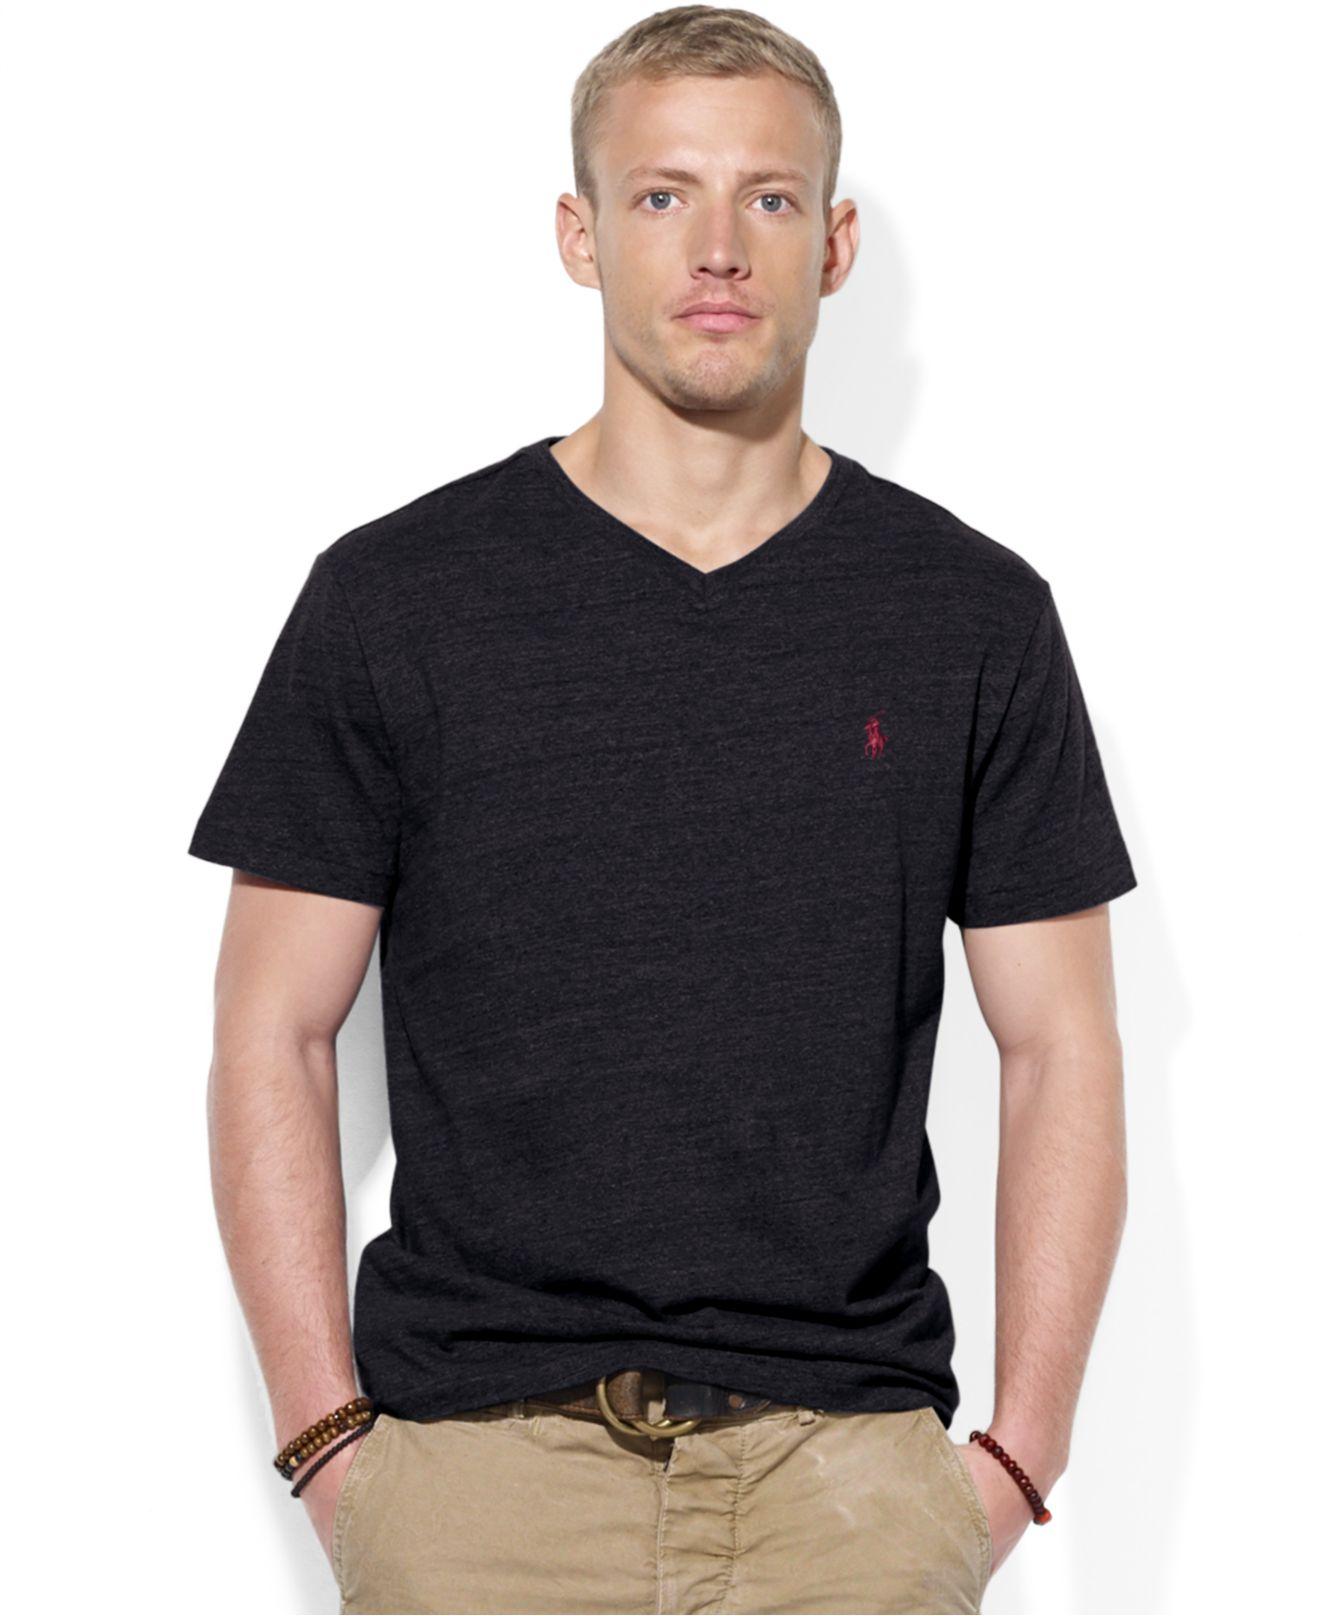 3971eb85d55a amazon ralph lauren polo vneck shirts for men a5603 558bc